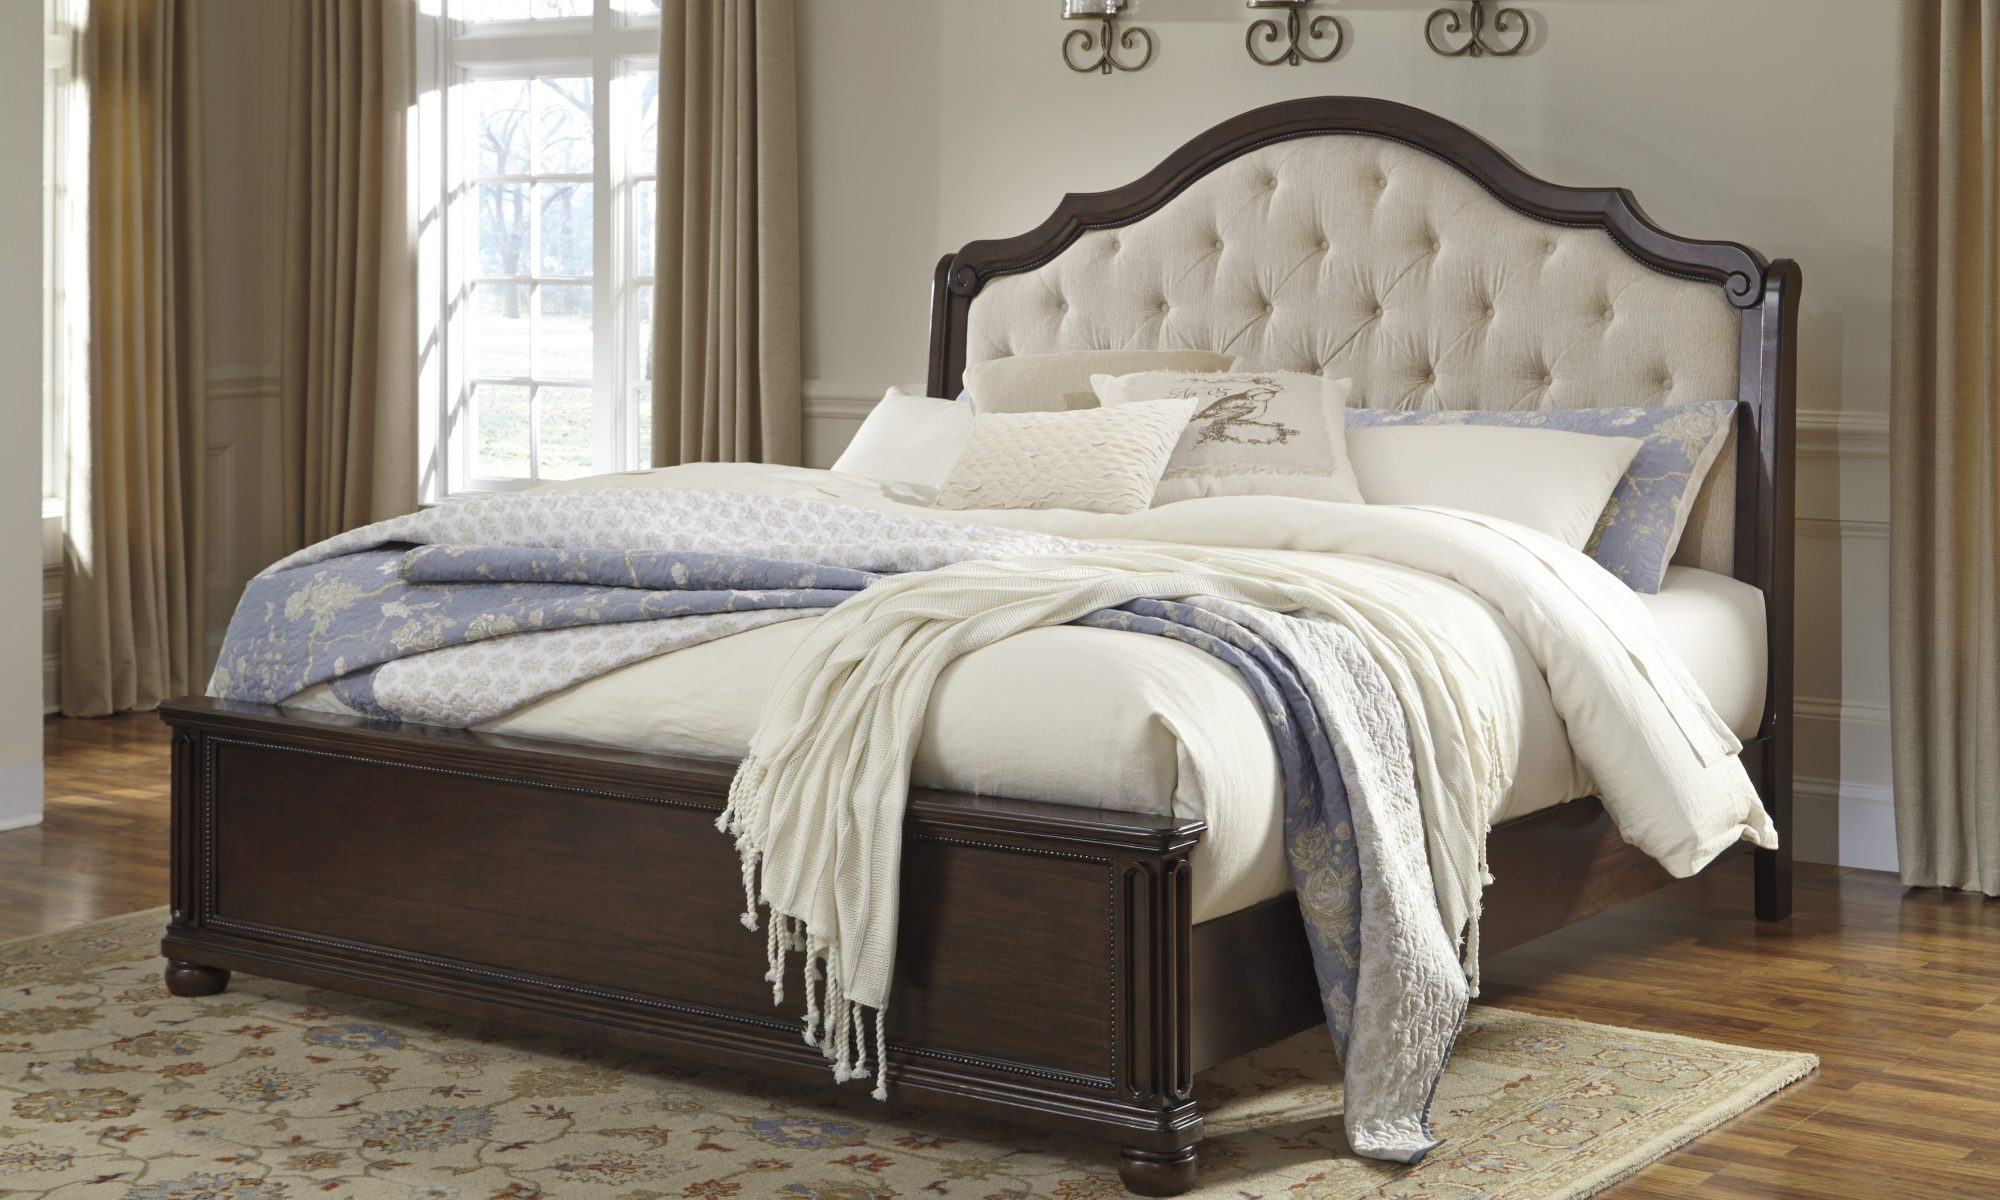 Sypialnia stylowa 596